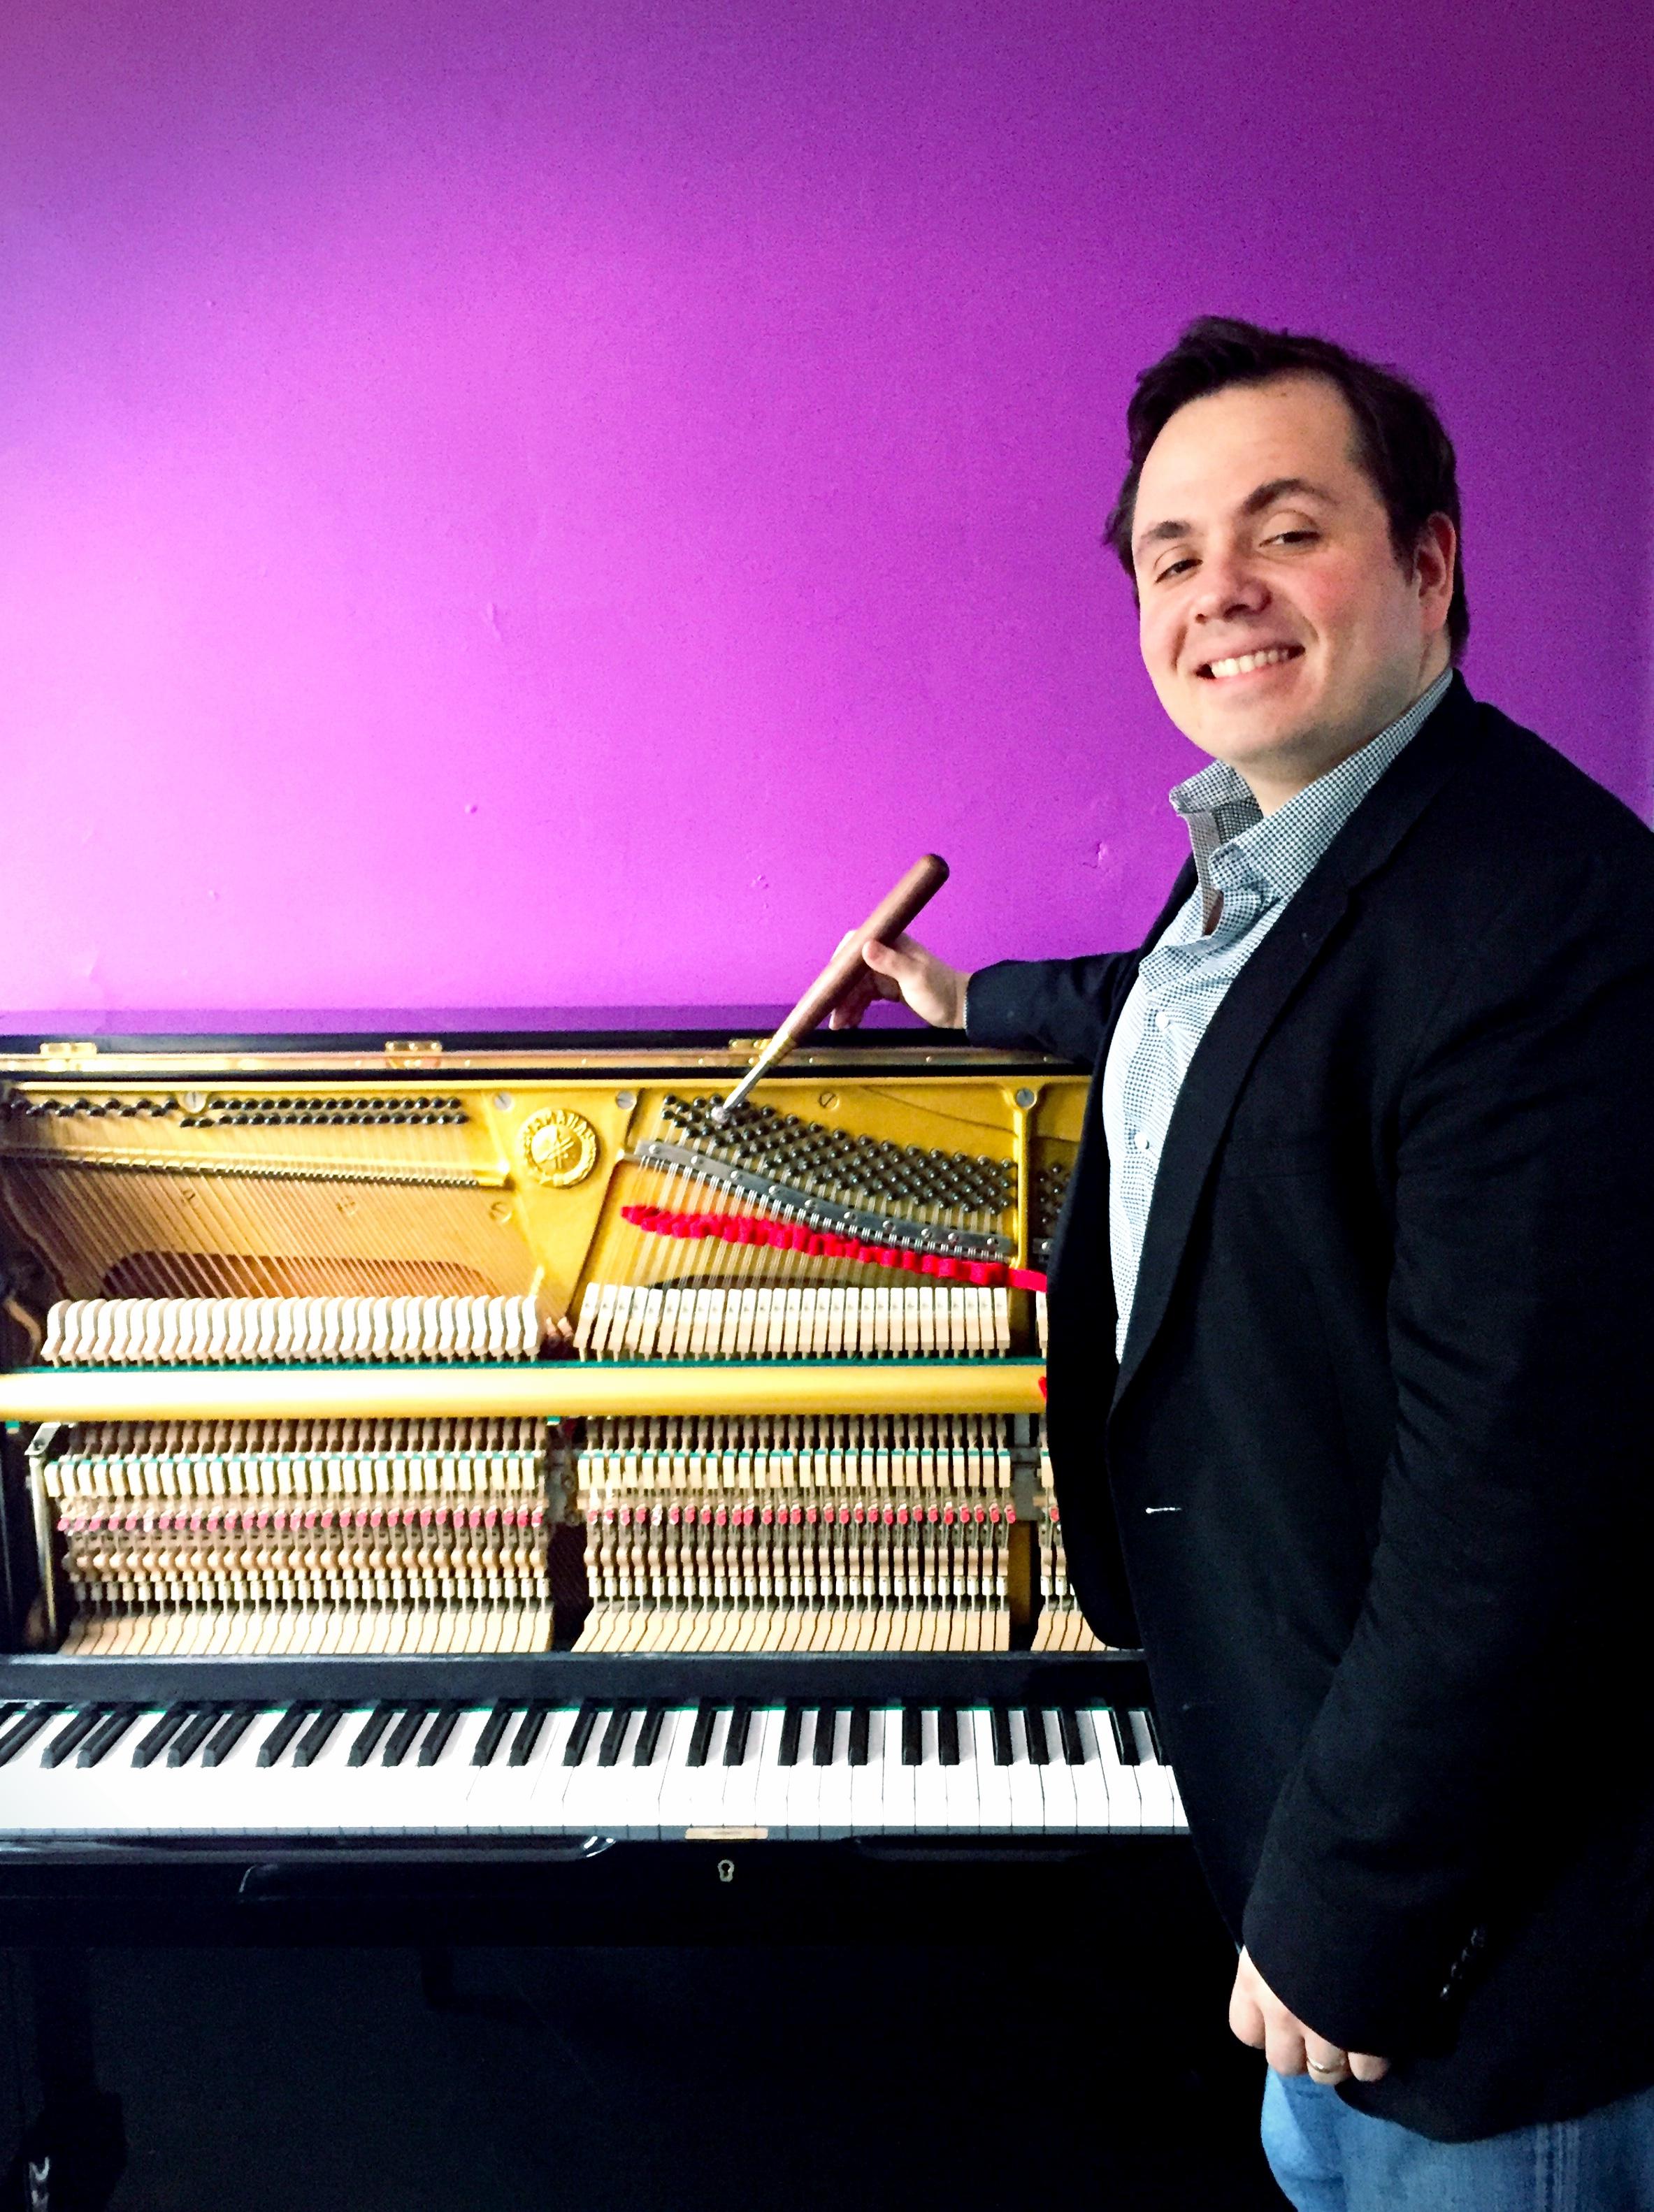 Joseph Brooklyn New York Piano Tuner.jpeg